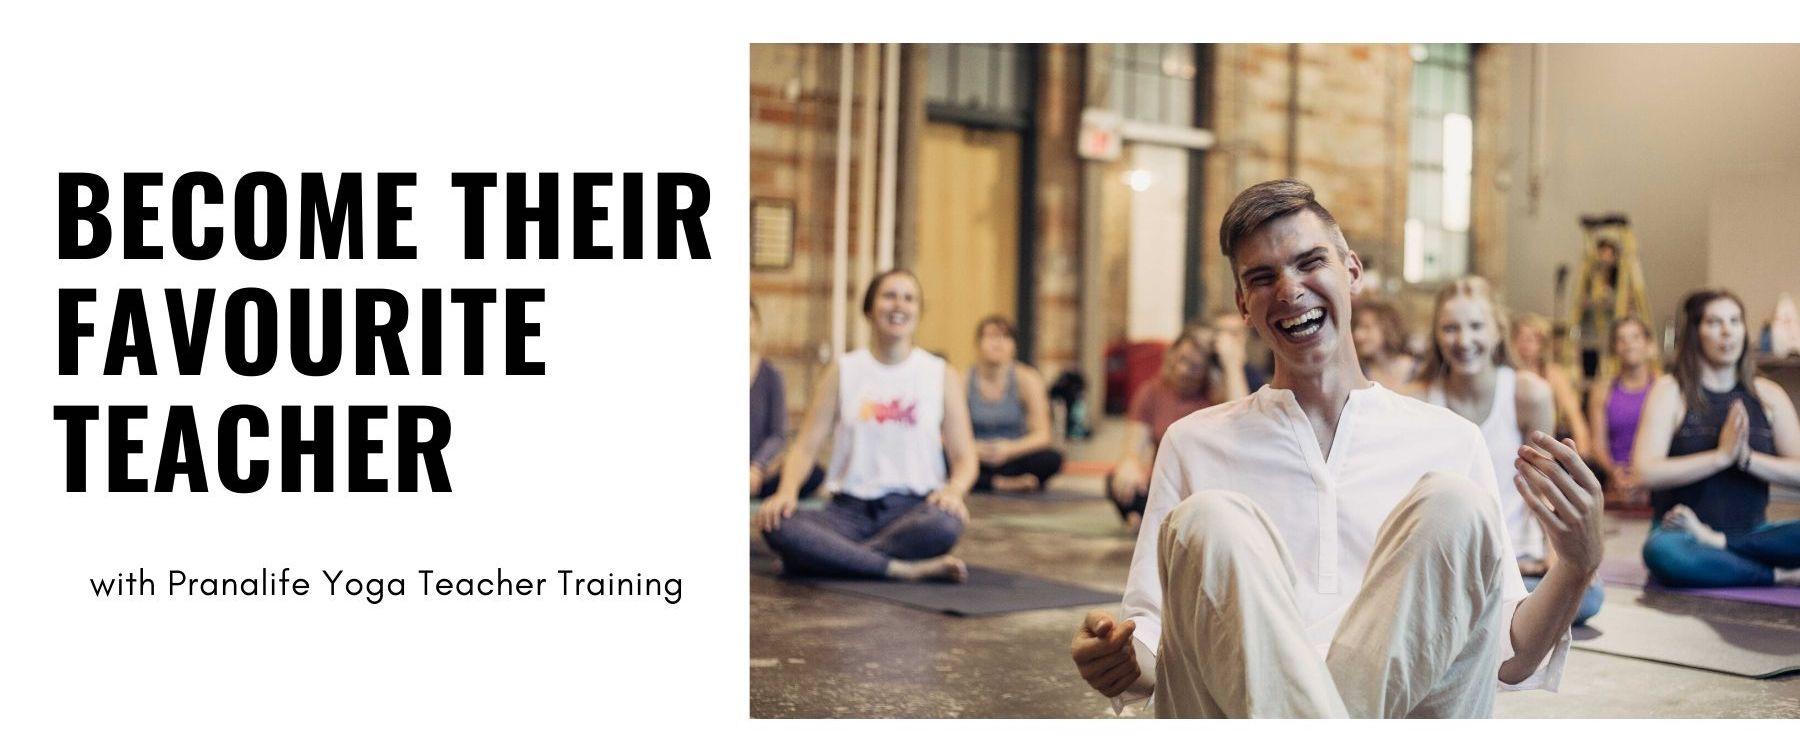 Become A Certified Yoga Teacher With Pranalife Yoga Teacher Training